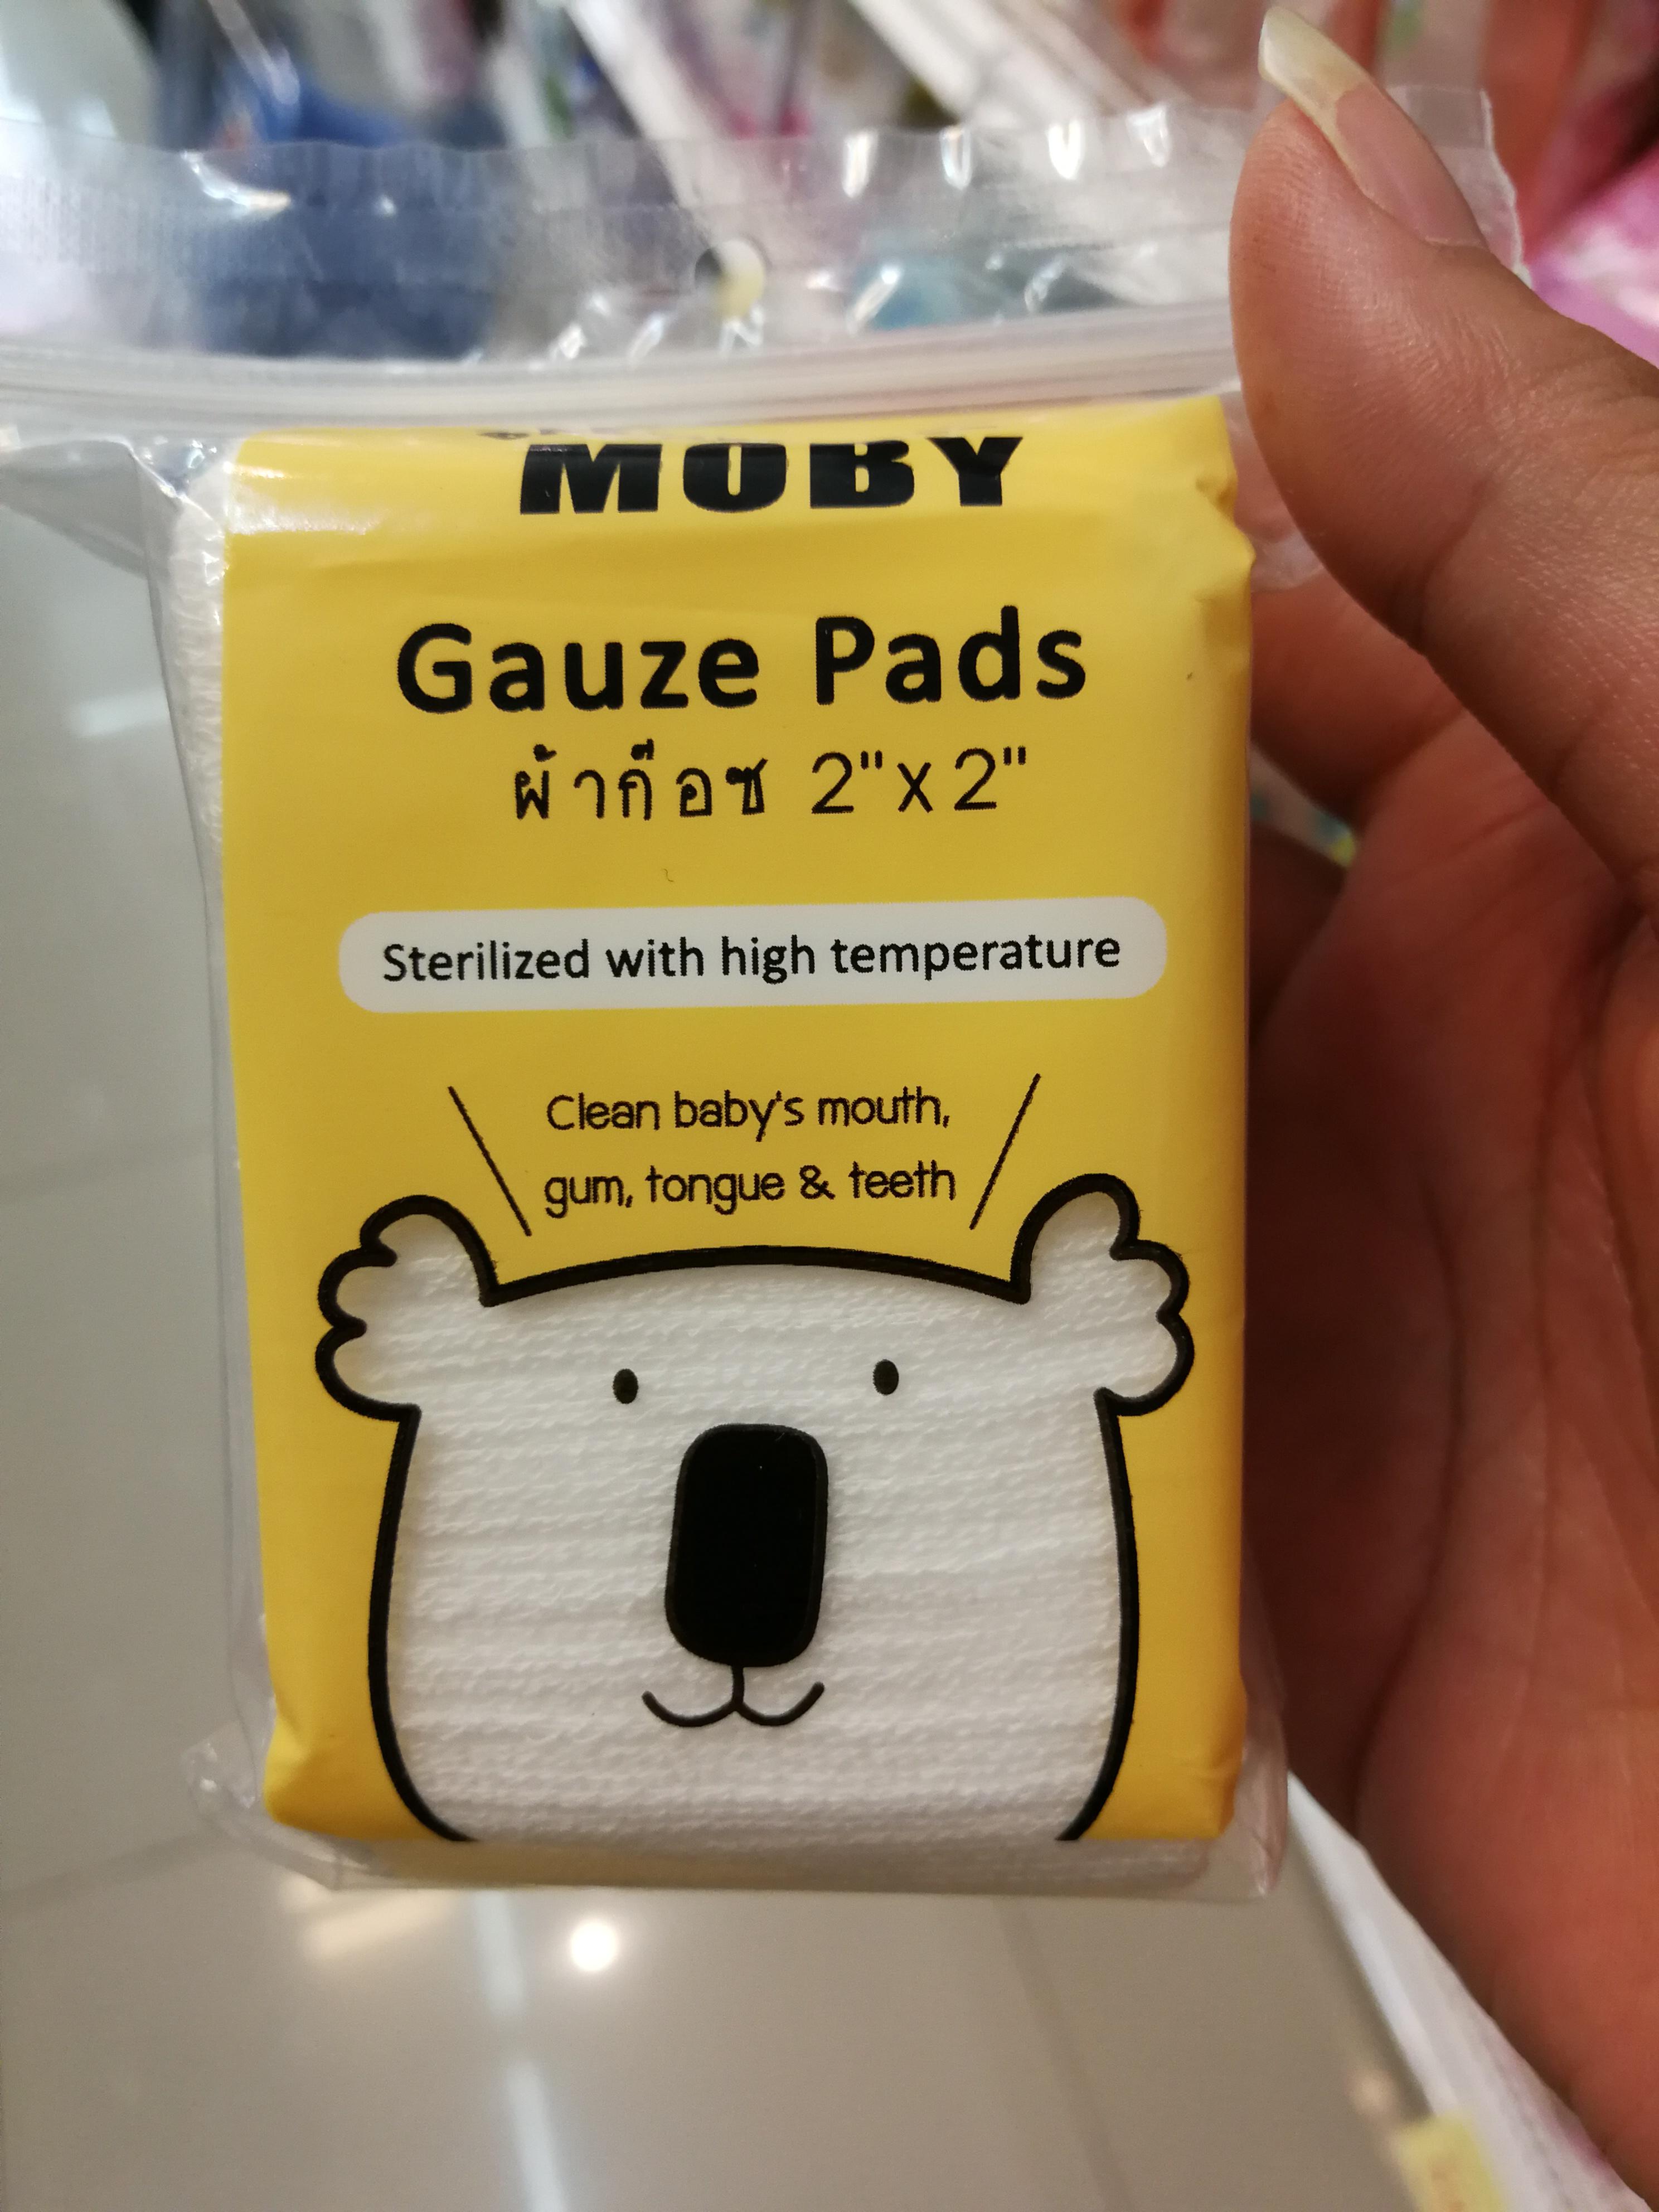 MOBY-GAUZE ผ้าก๊อซ โมบี้ รุ่นพกพา ขนาด 2 x 2 50 แผ่น